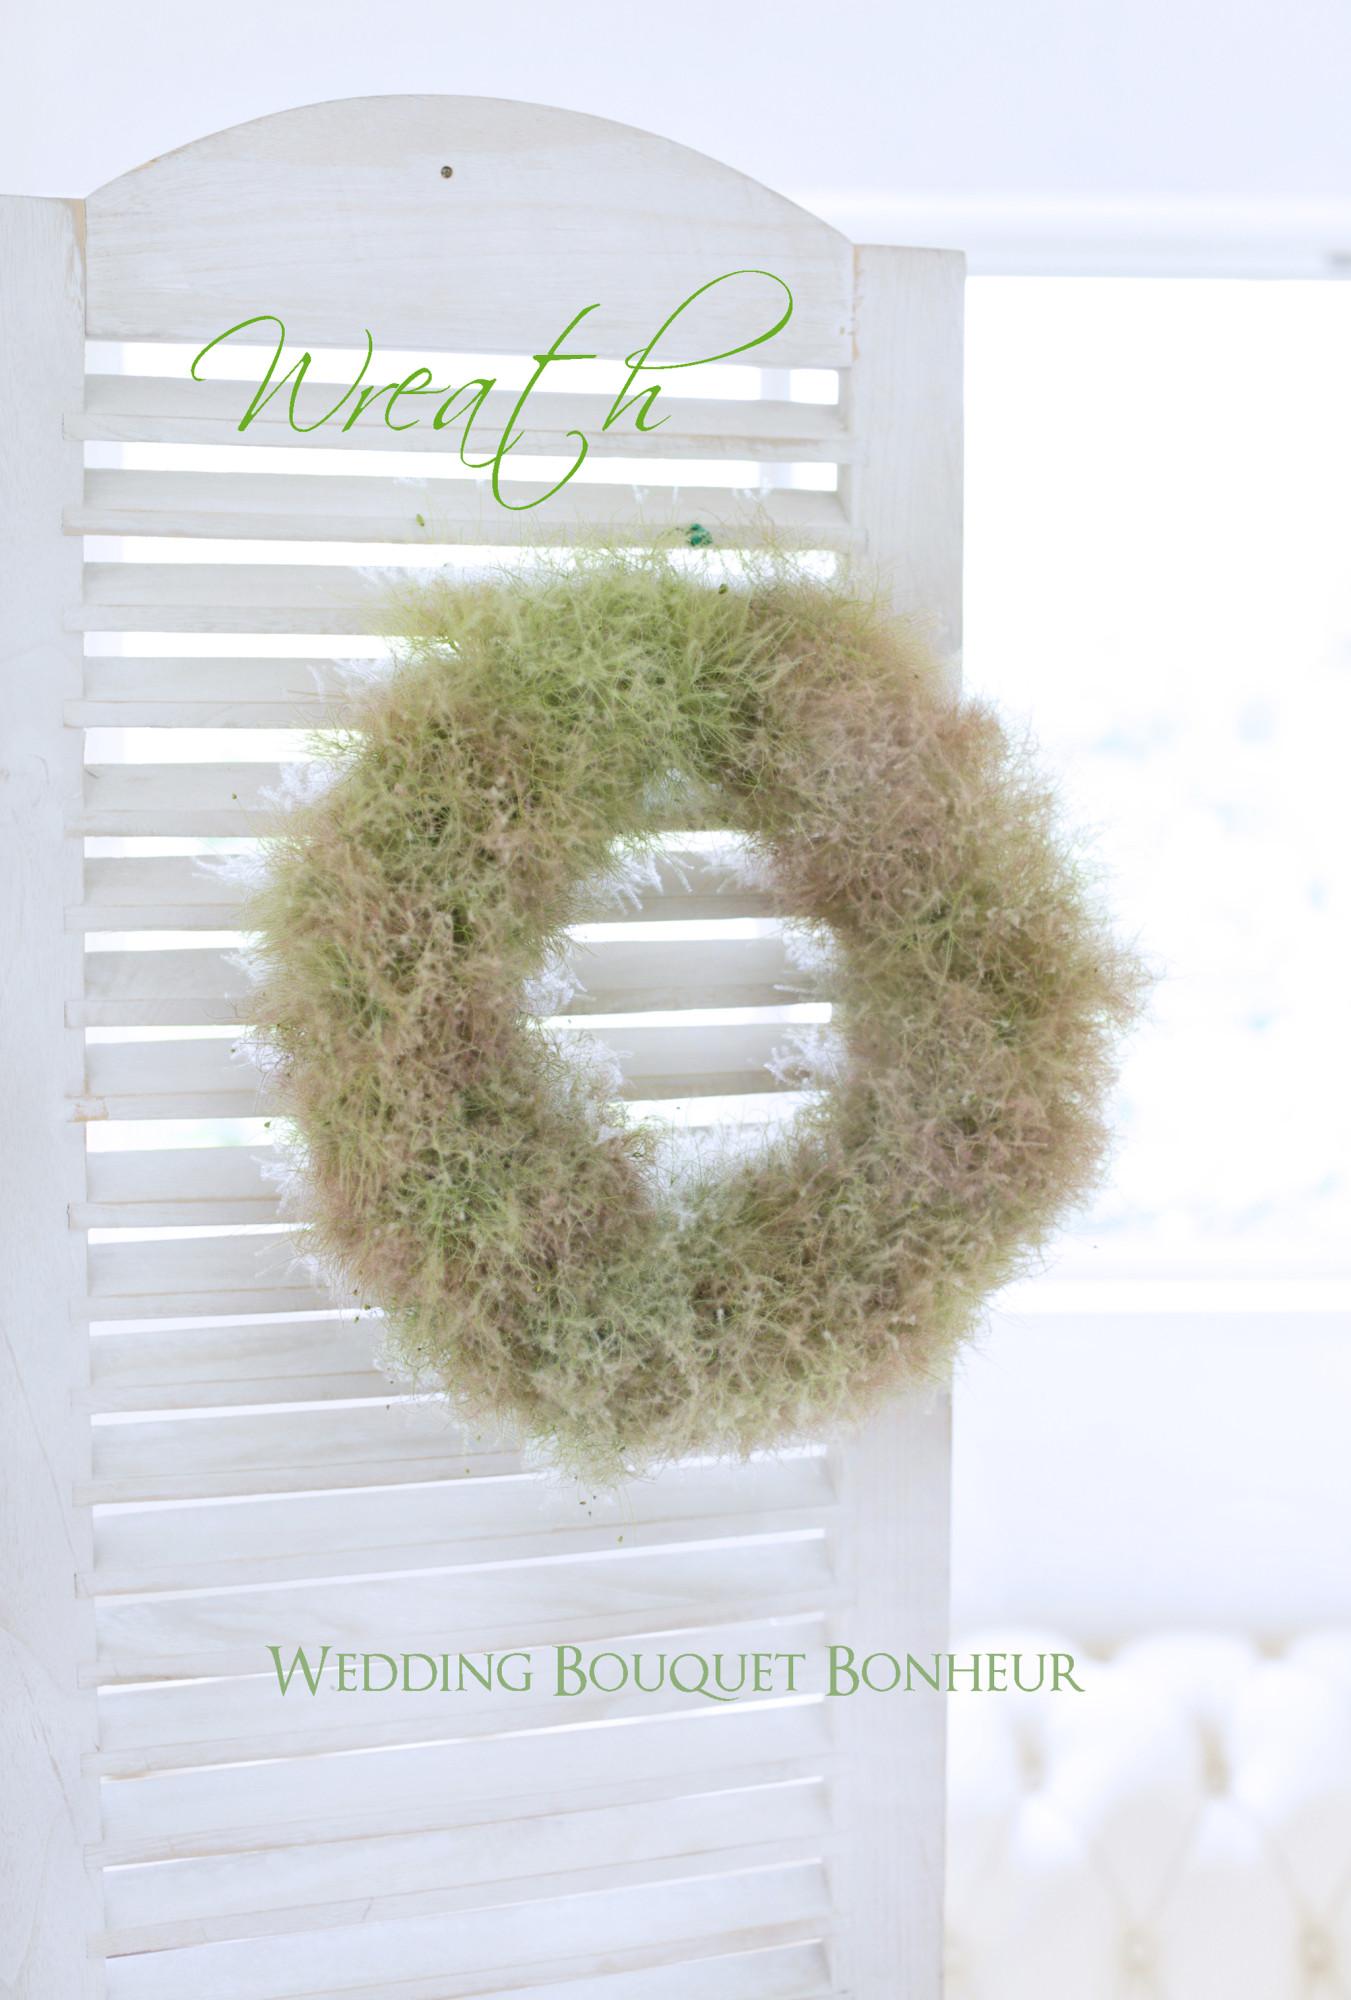 b_wreath20180523_2